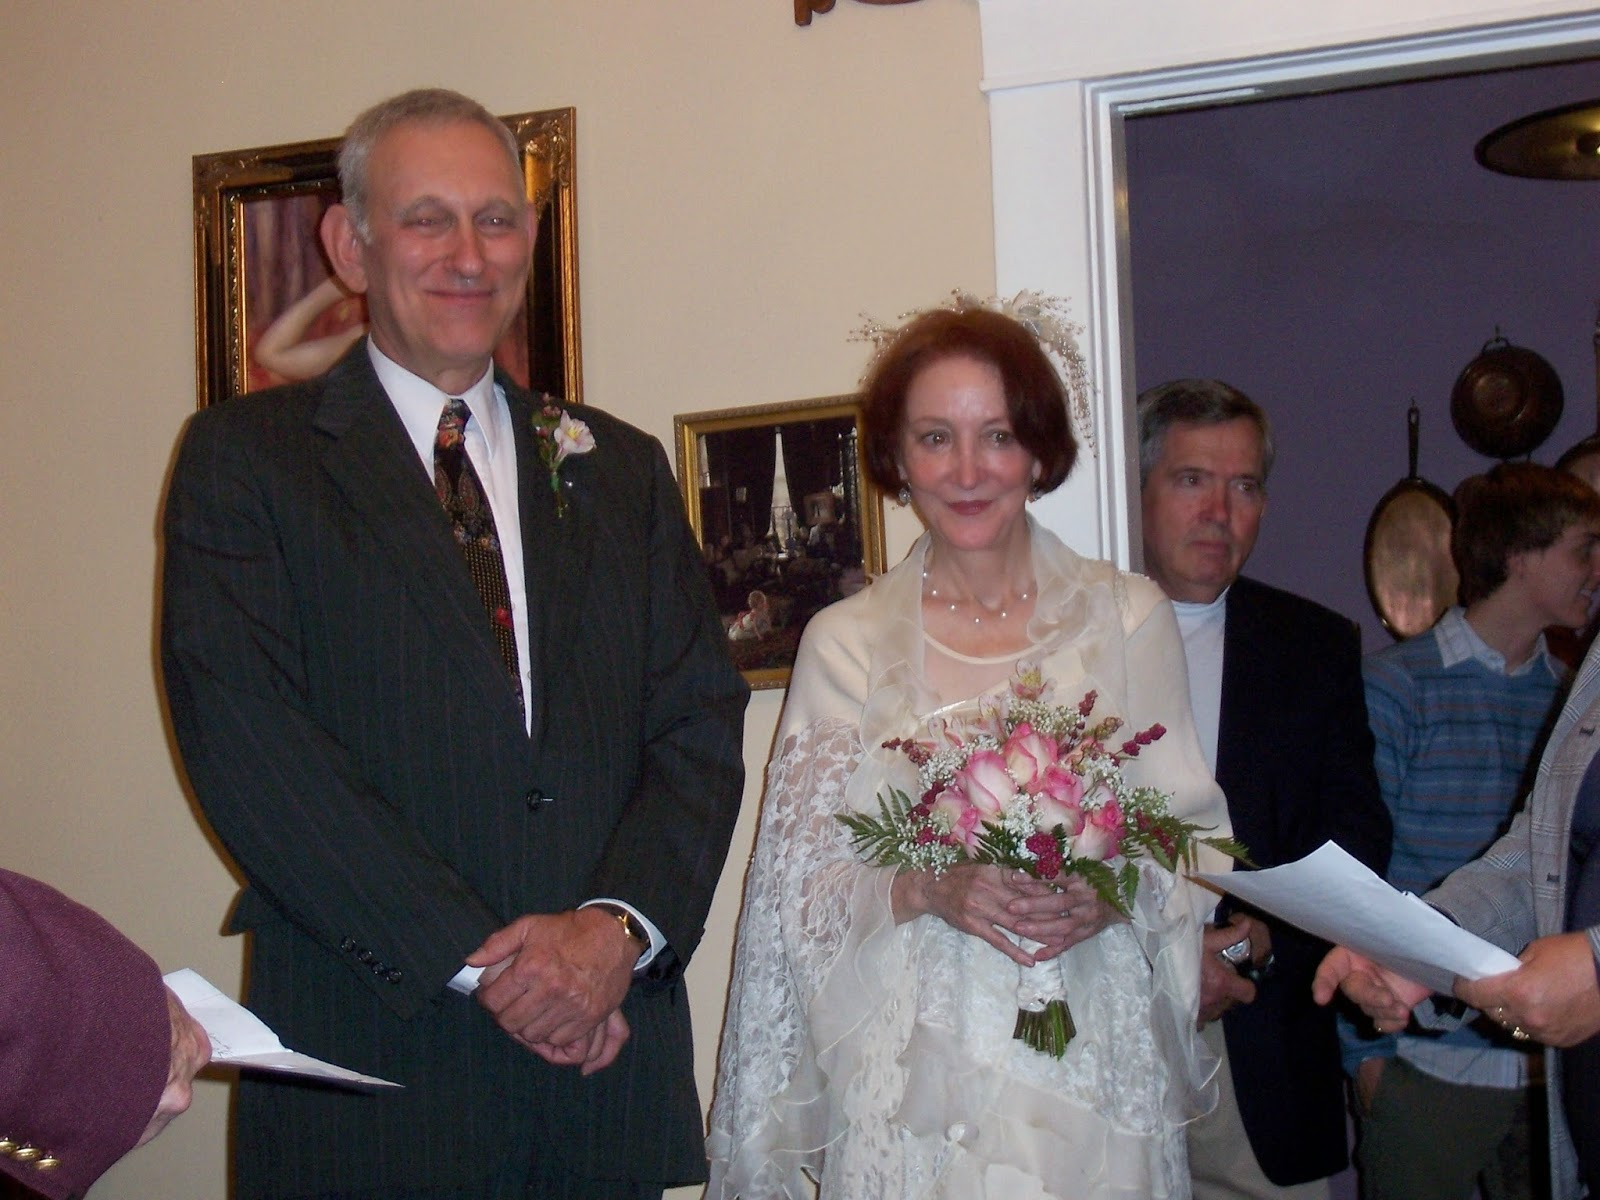 Wedding Dresses Murfreesboro Tn 94 Cute We were married in